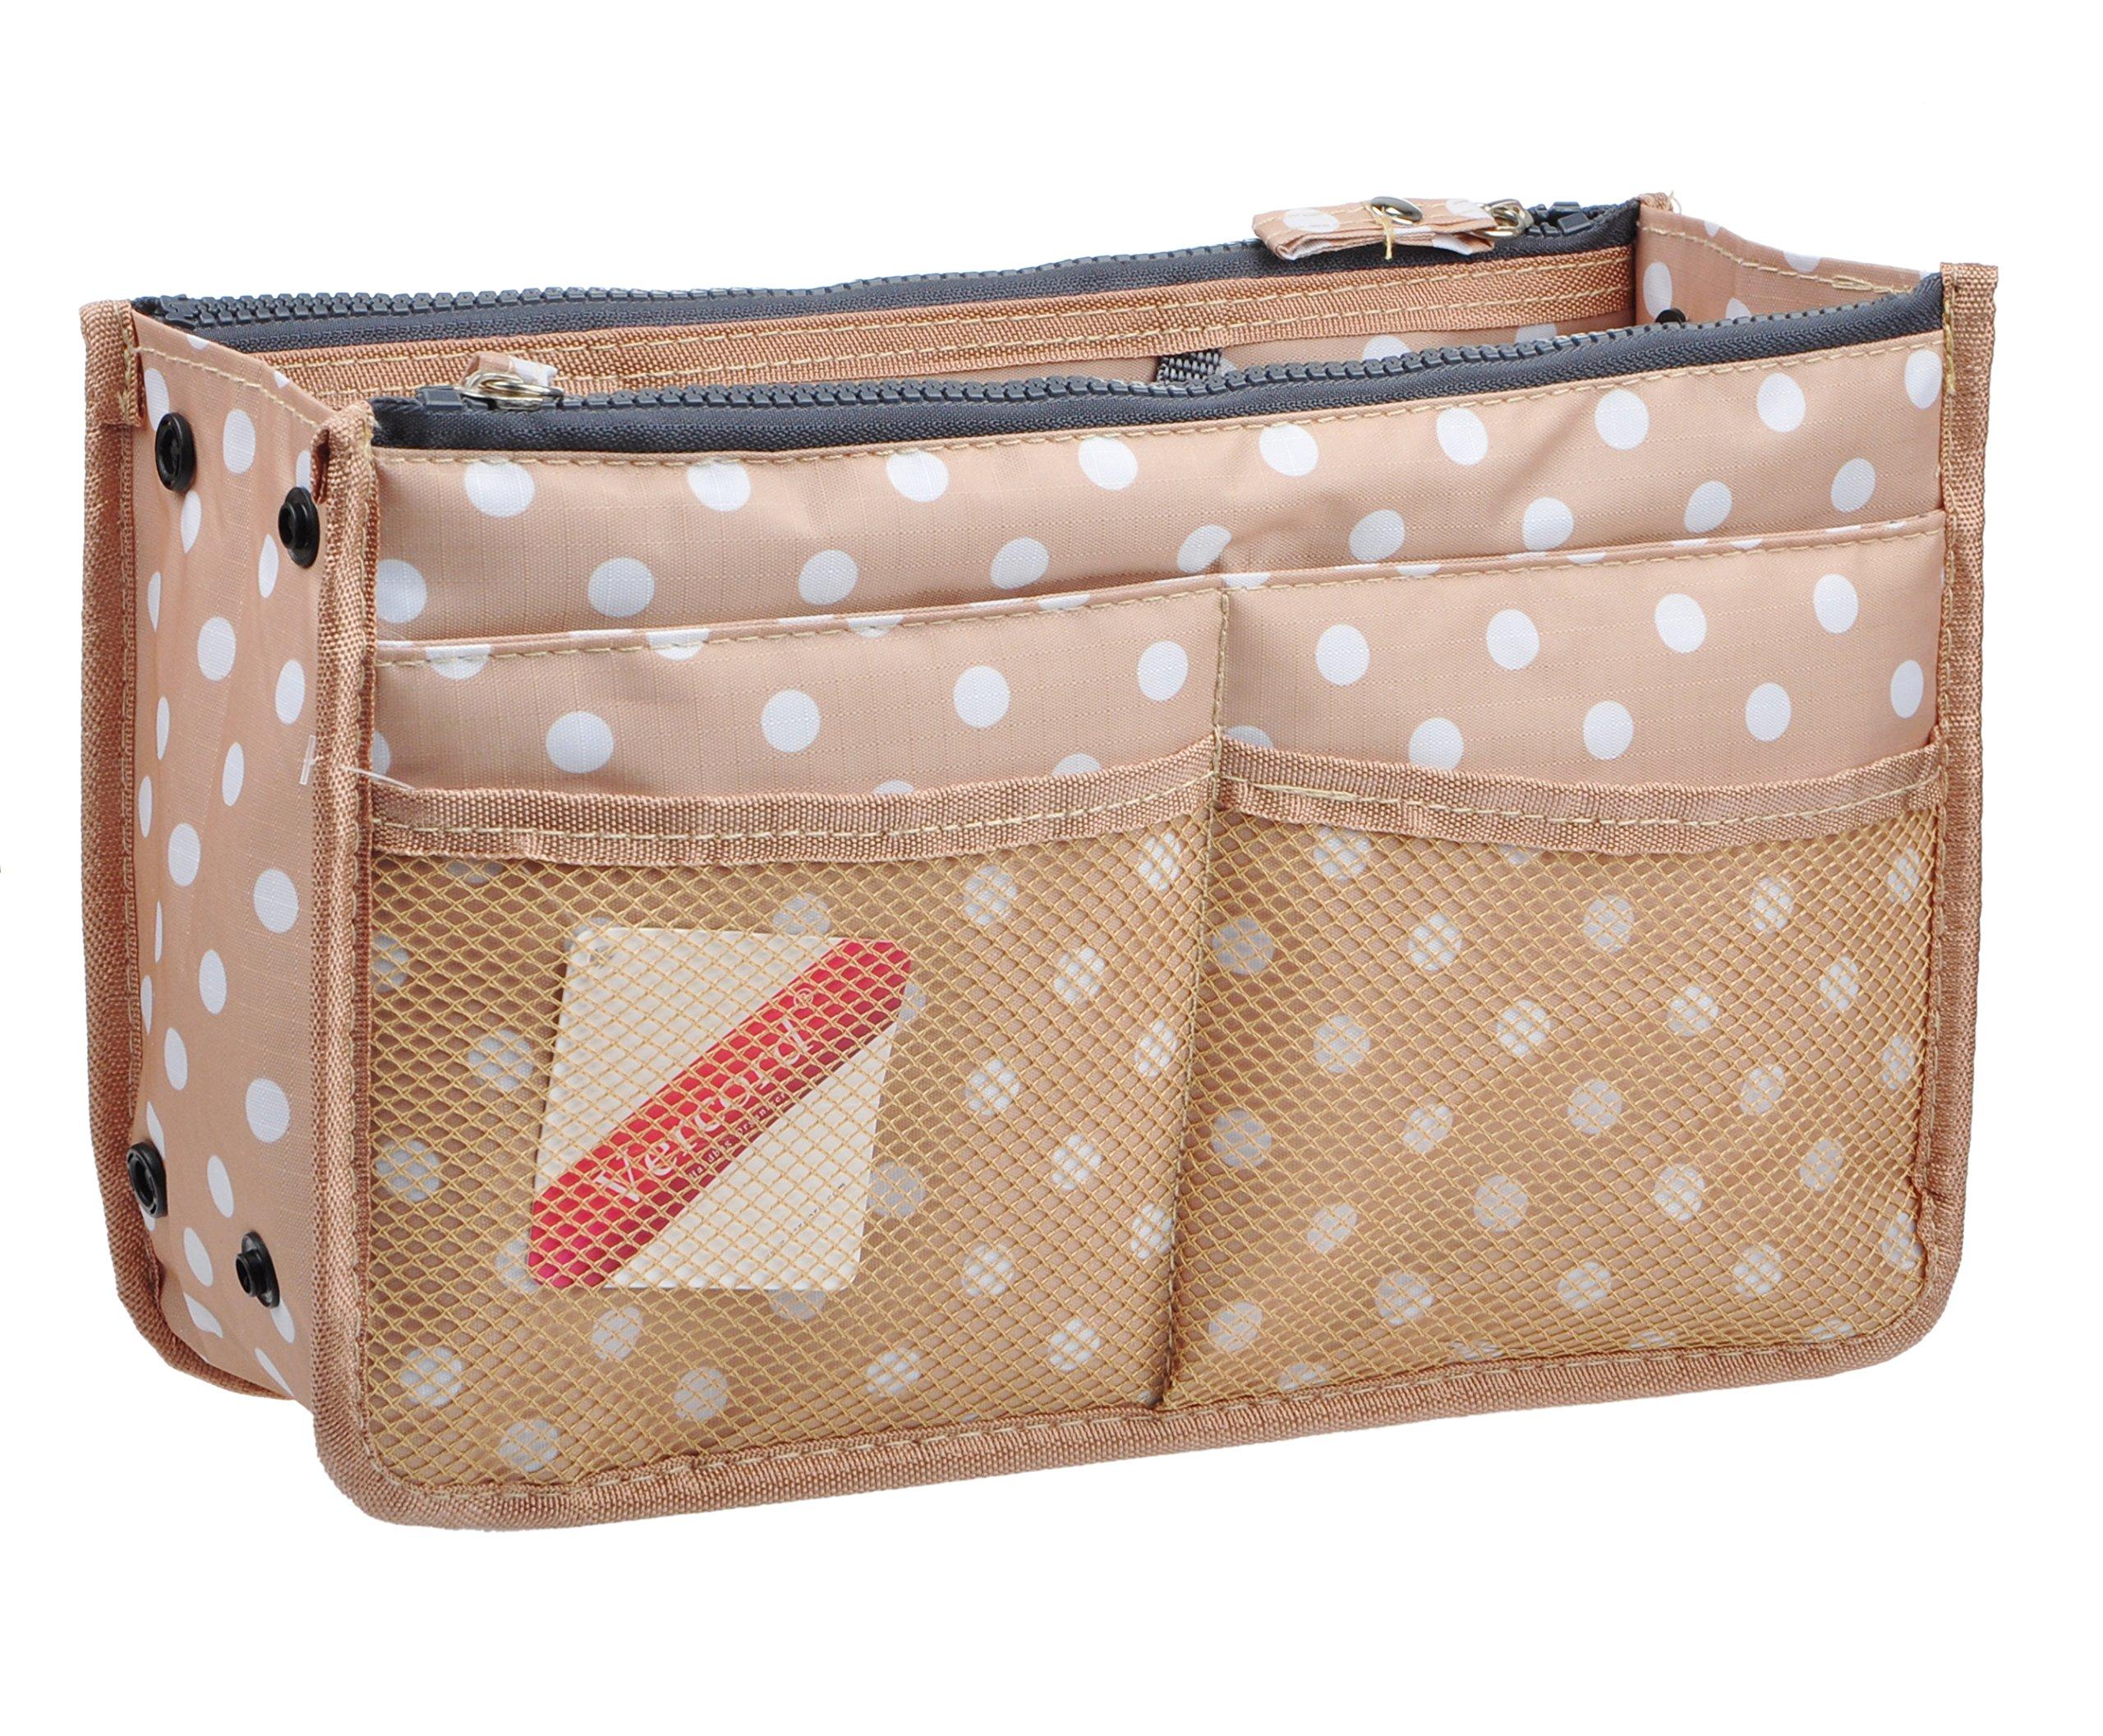 Vercord Updated Purse Handbag Organizer Insert Liner Bag in Bag 13 Pockets 3 Size, Beige Dot M